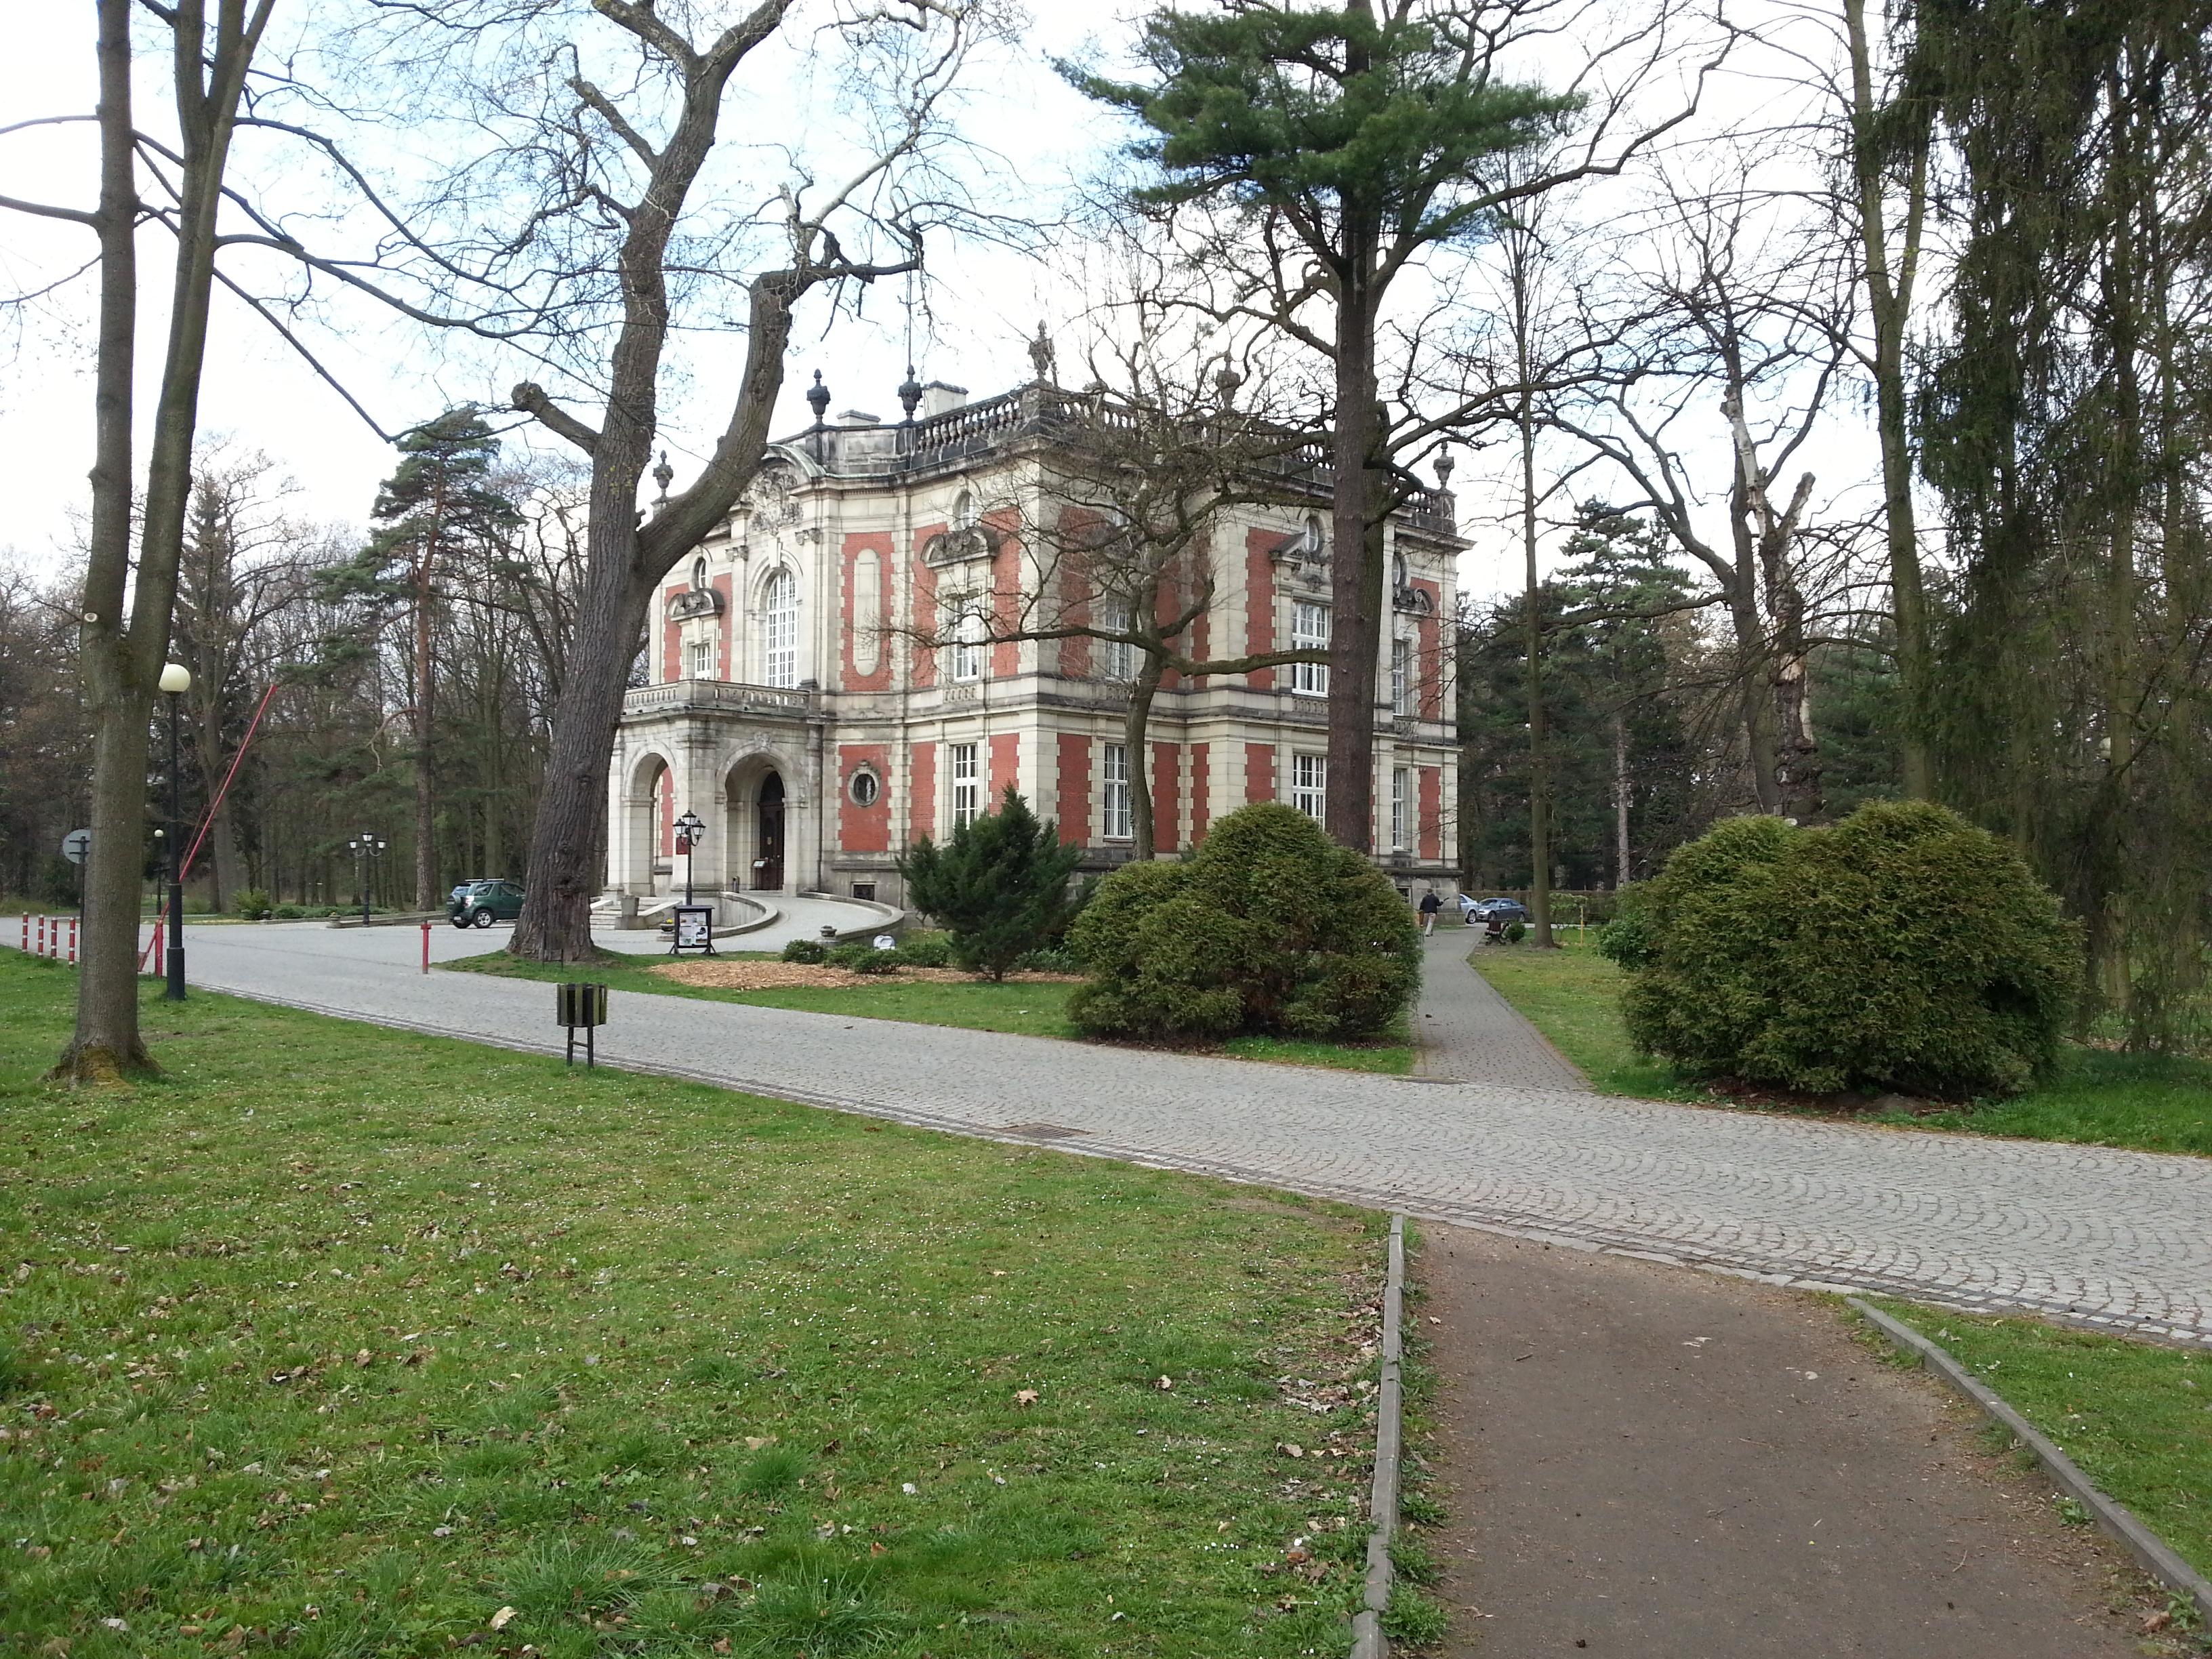 Pałac kawalera w świerklanieckim parku